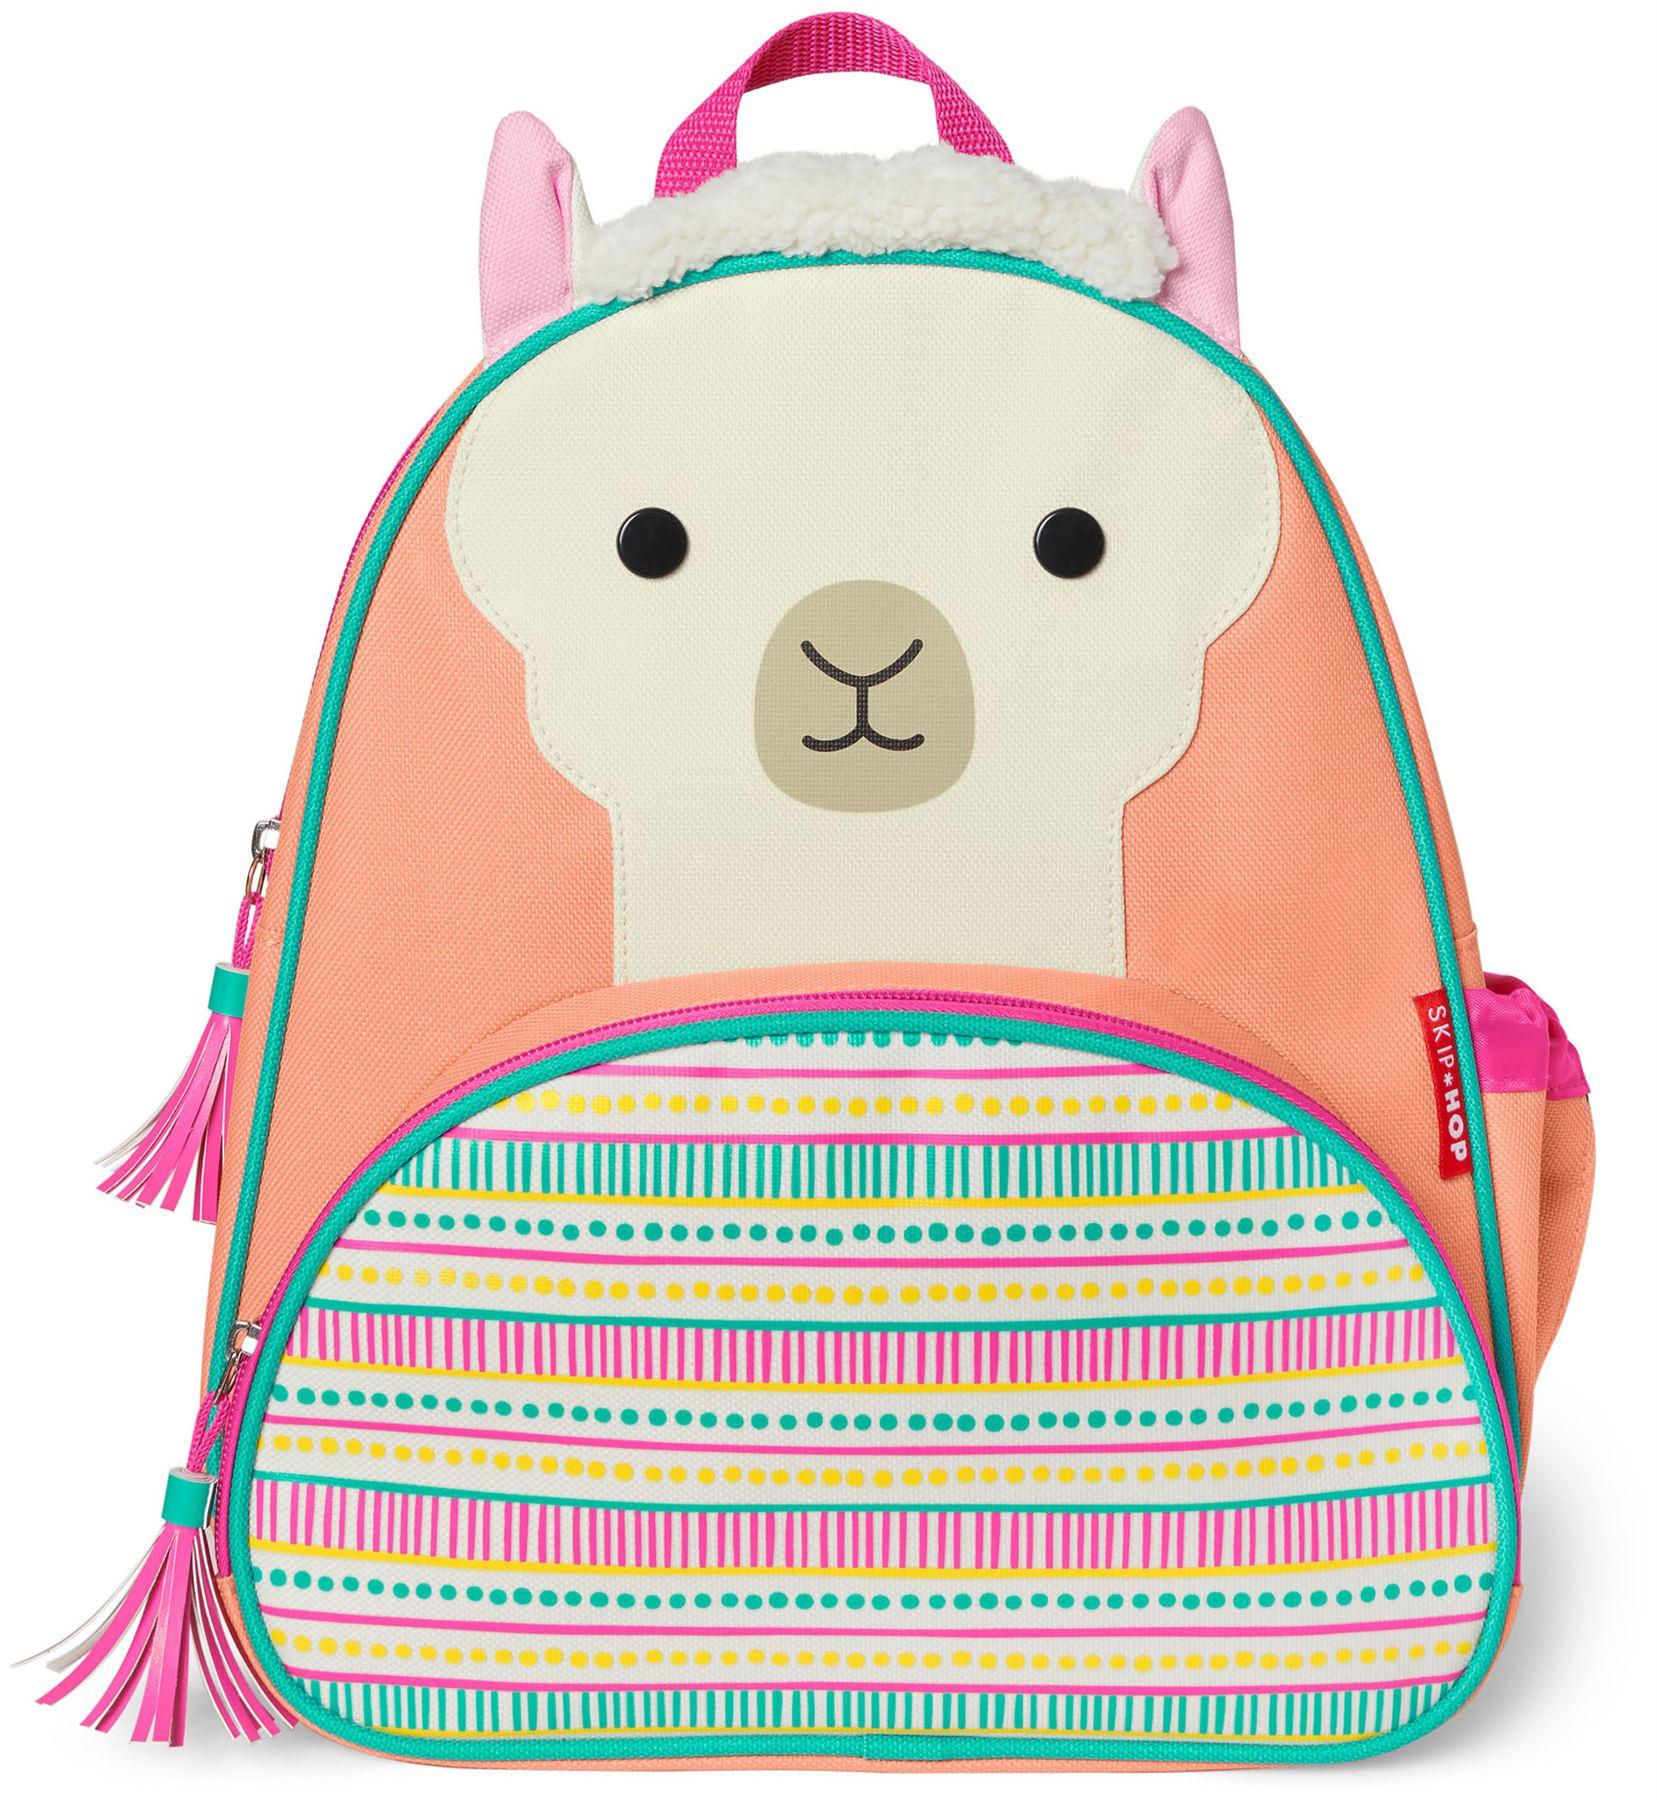 LLAMA Kids Clothes Accessories Bags BN Skip Hop ZOO LITTLE KID BACK PACK